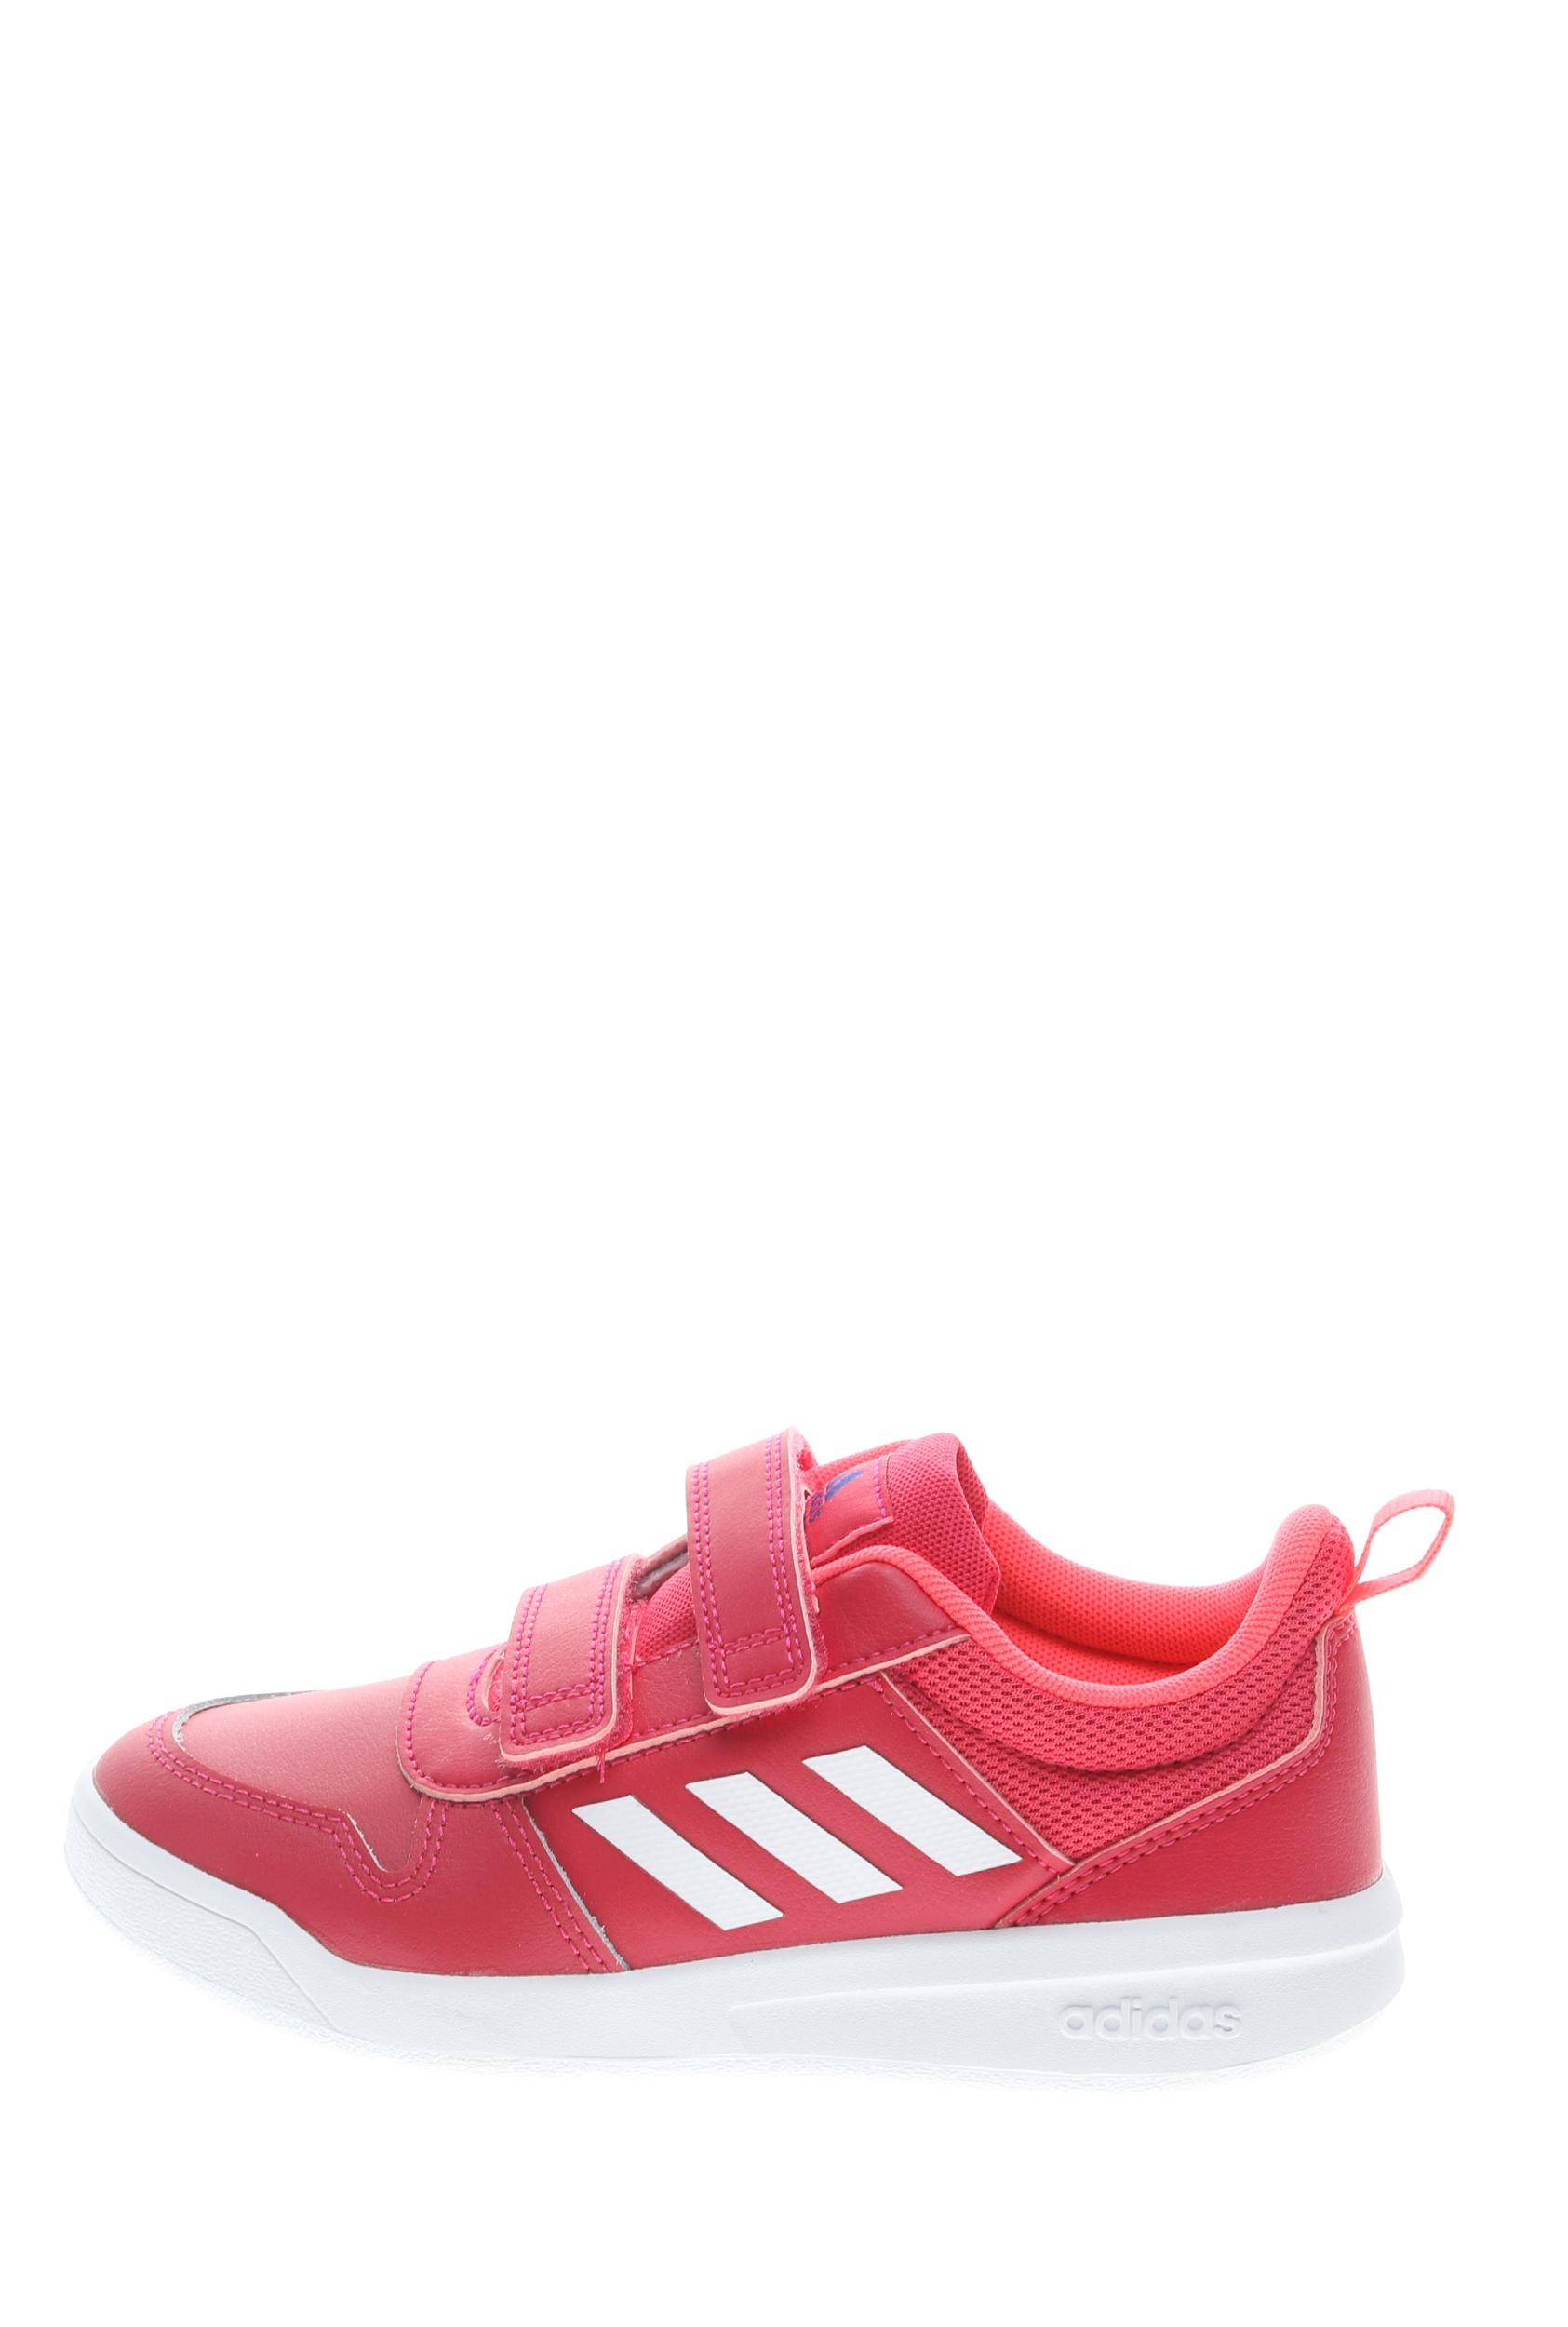 adidas Performance – Παιδικά παπούτσια adidas Performance VECTOR C ροζ